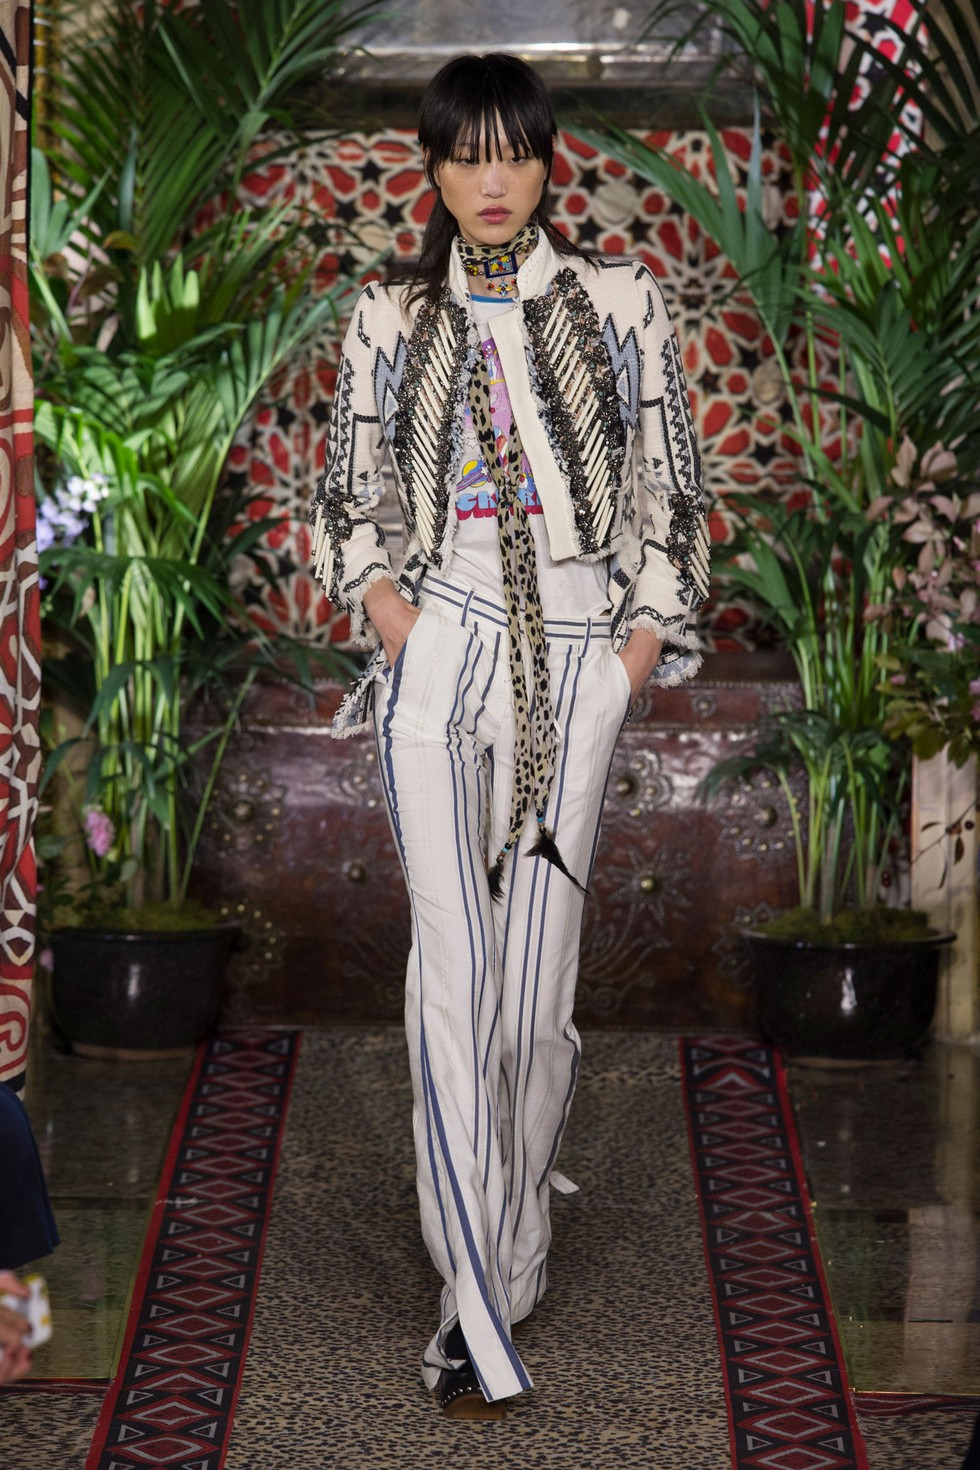 Roberto Cavalli fashion dresses milan fashion spring summer 2017 Milan Fashion Spring Summer 2017 – day one best moments Roberto Cavalli 5